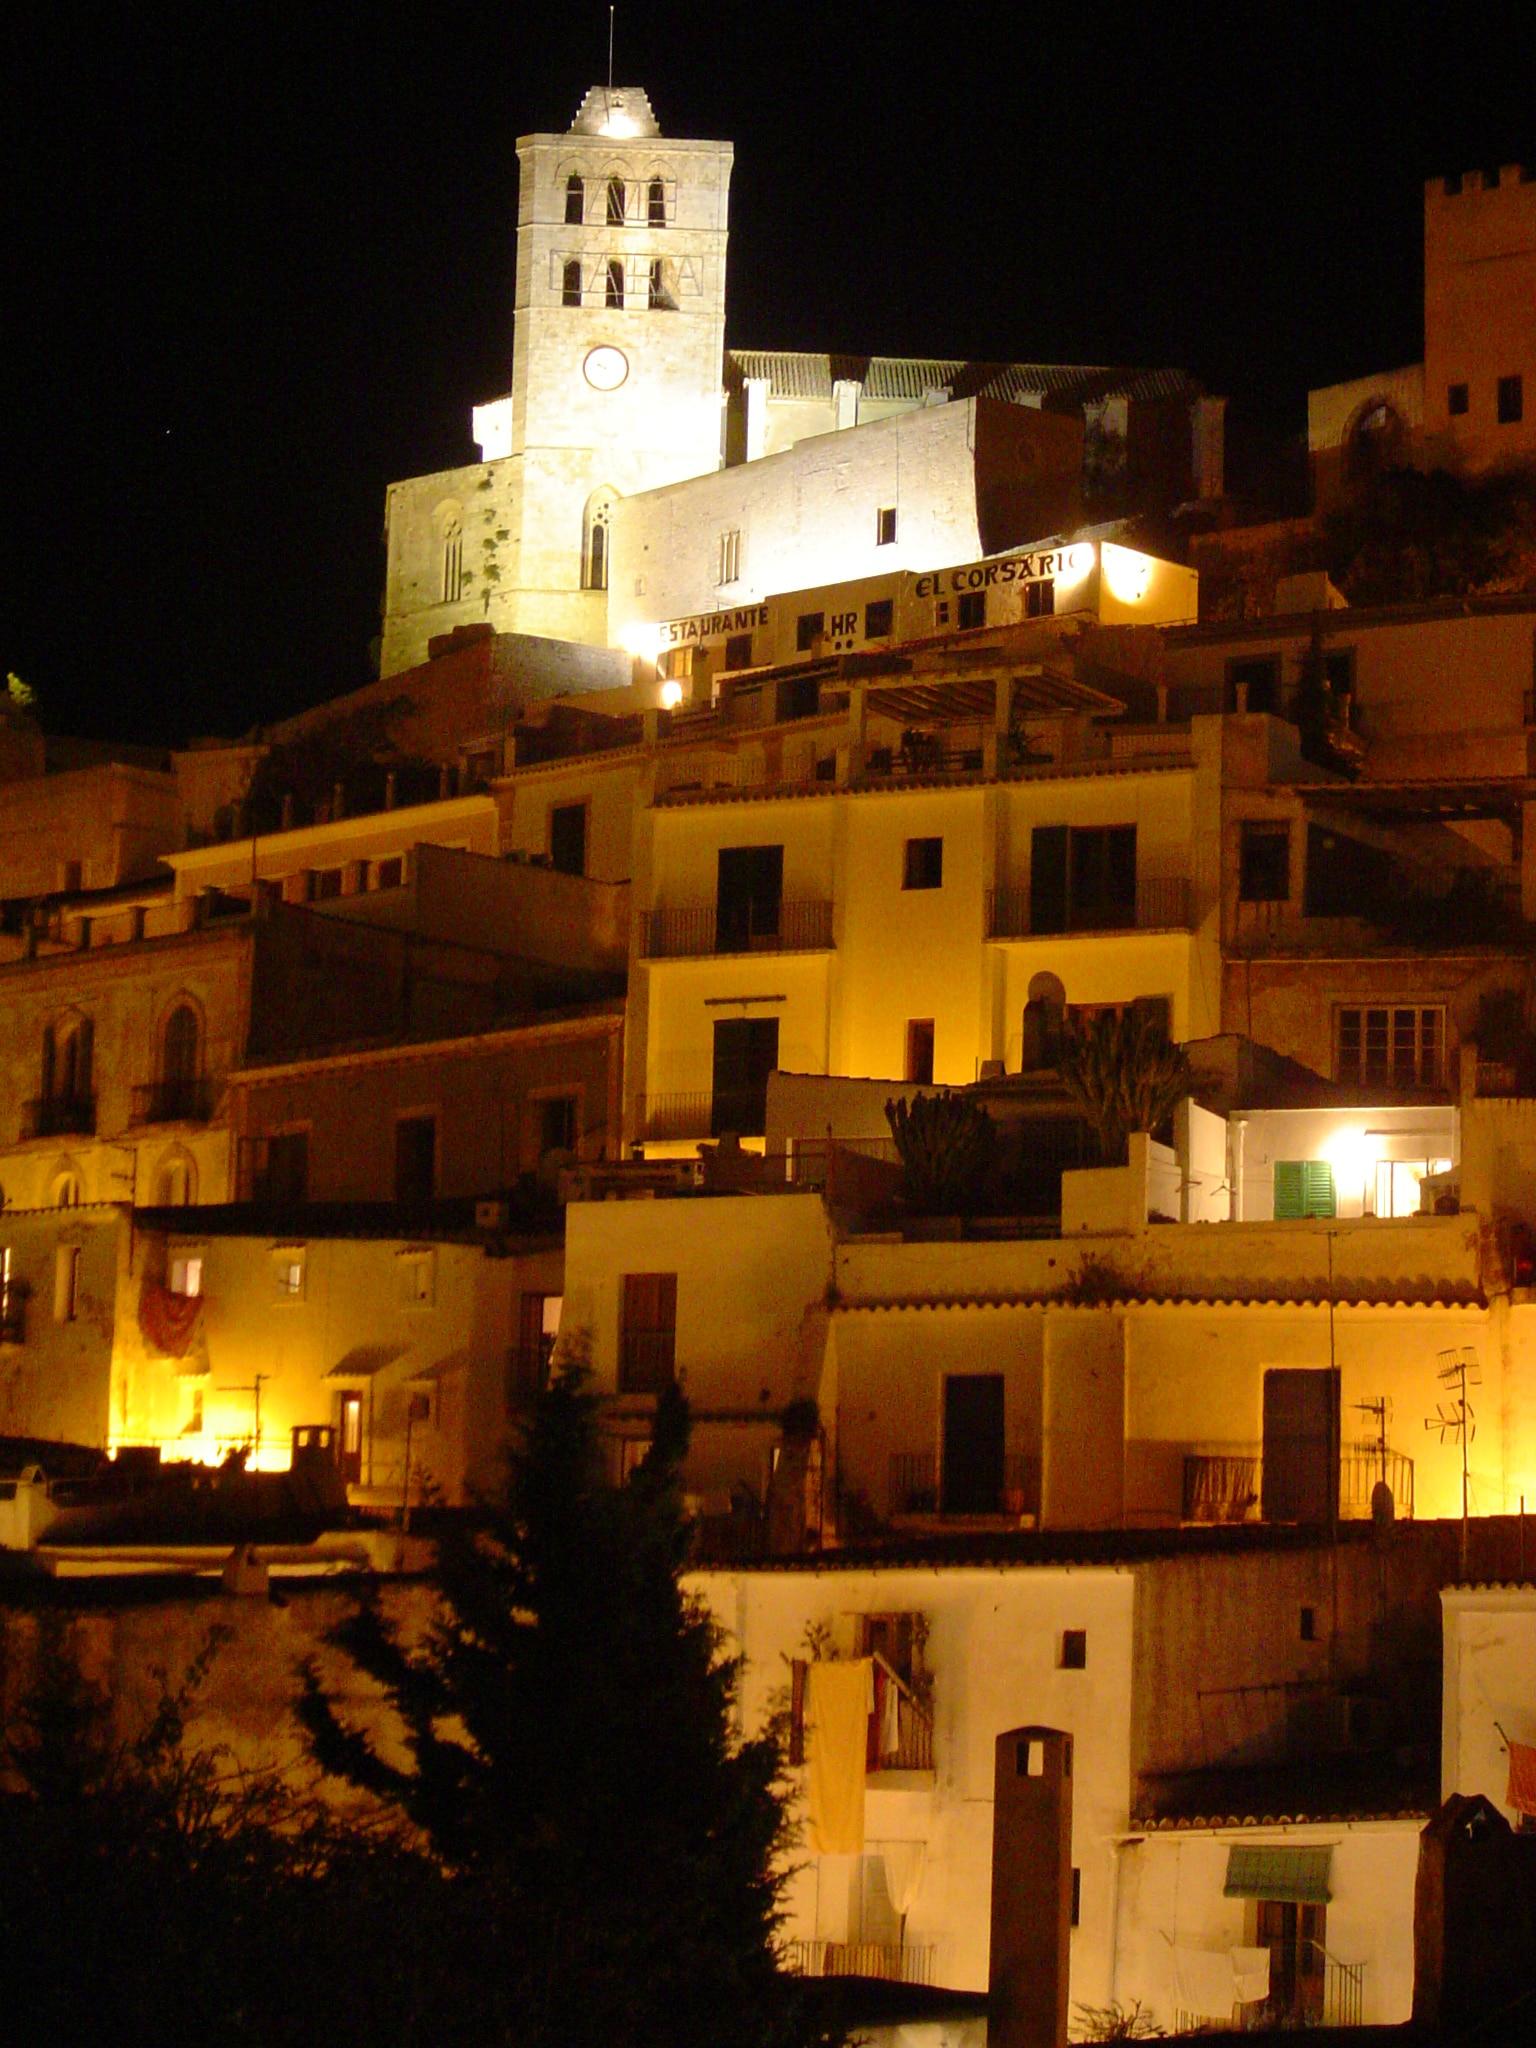 Spain: Settling in Exotic Espania